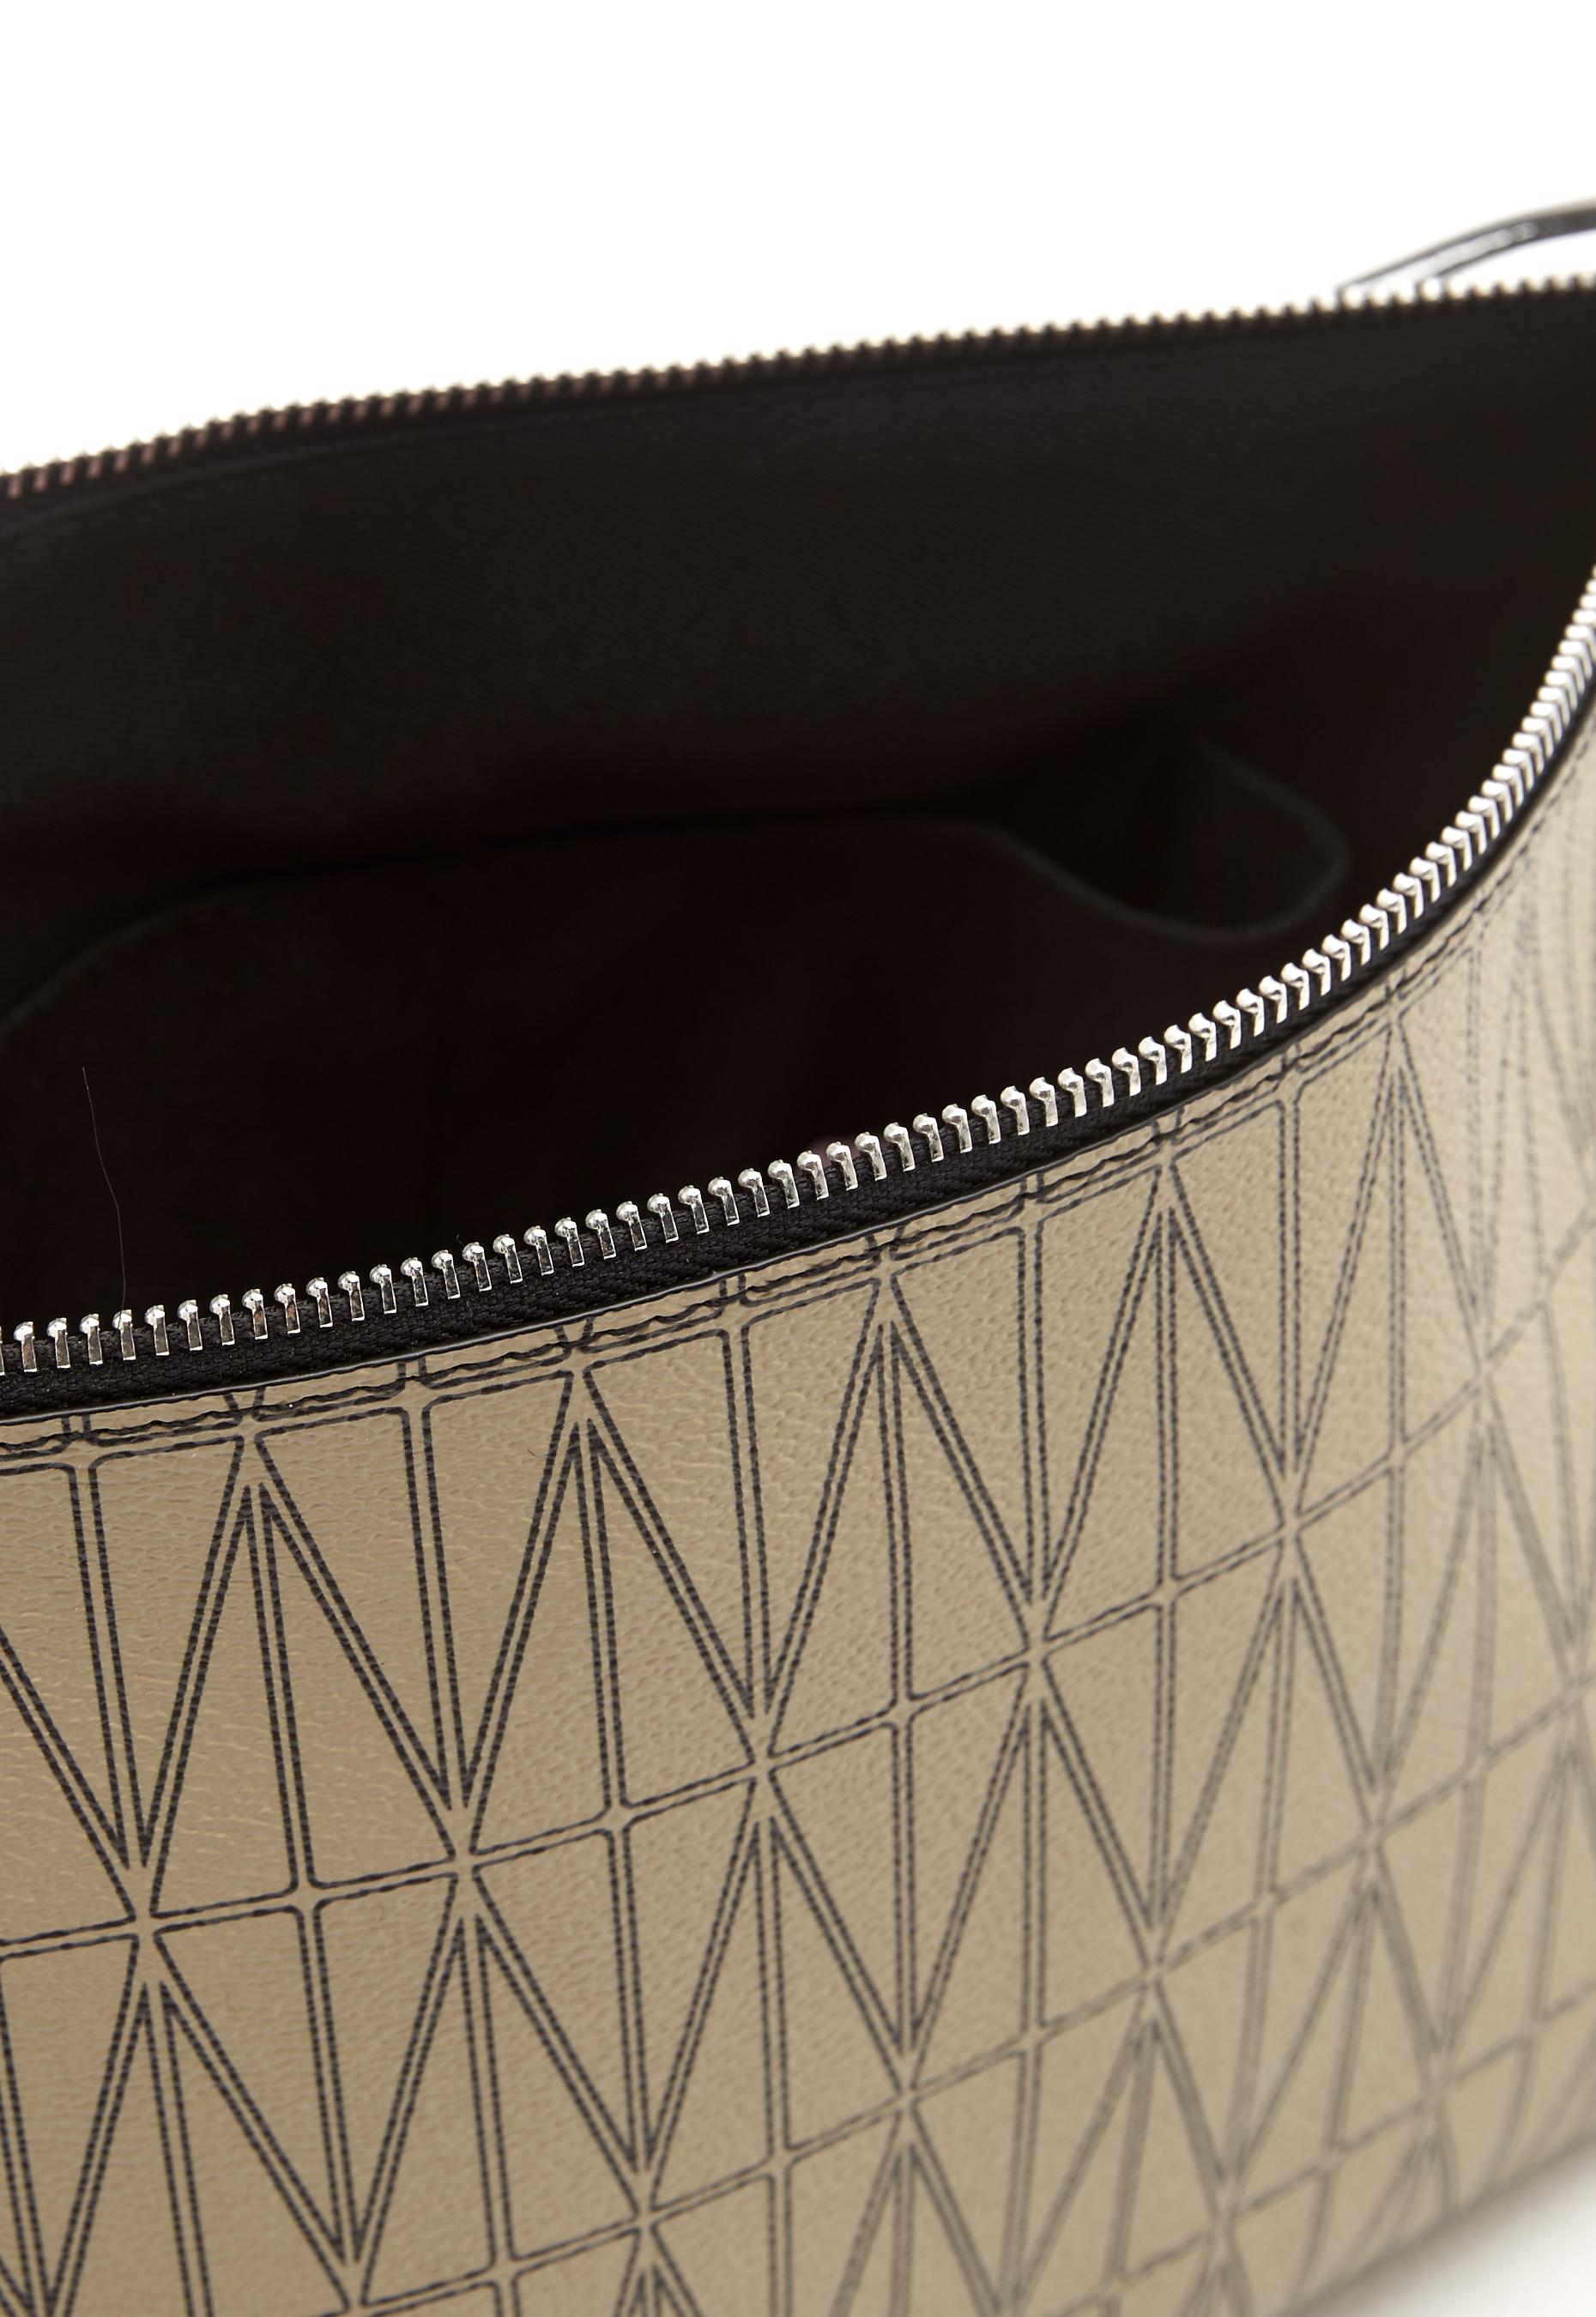 DAGMAR Herriot Make Up Bag Safari - Bubbleroom 38484c835fe54